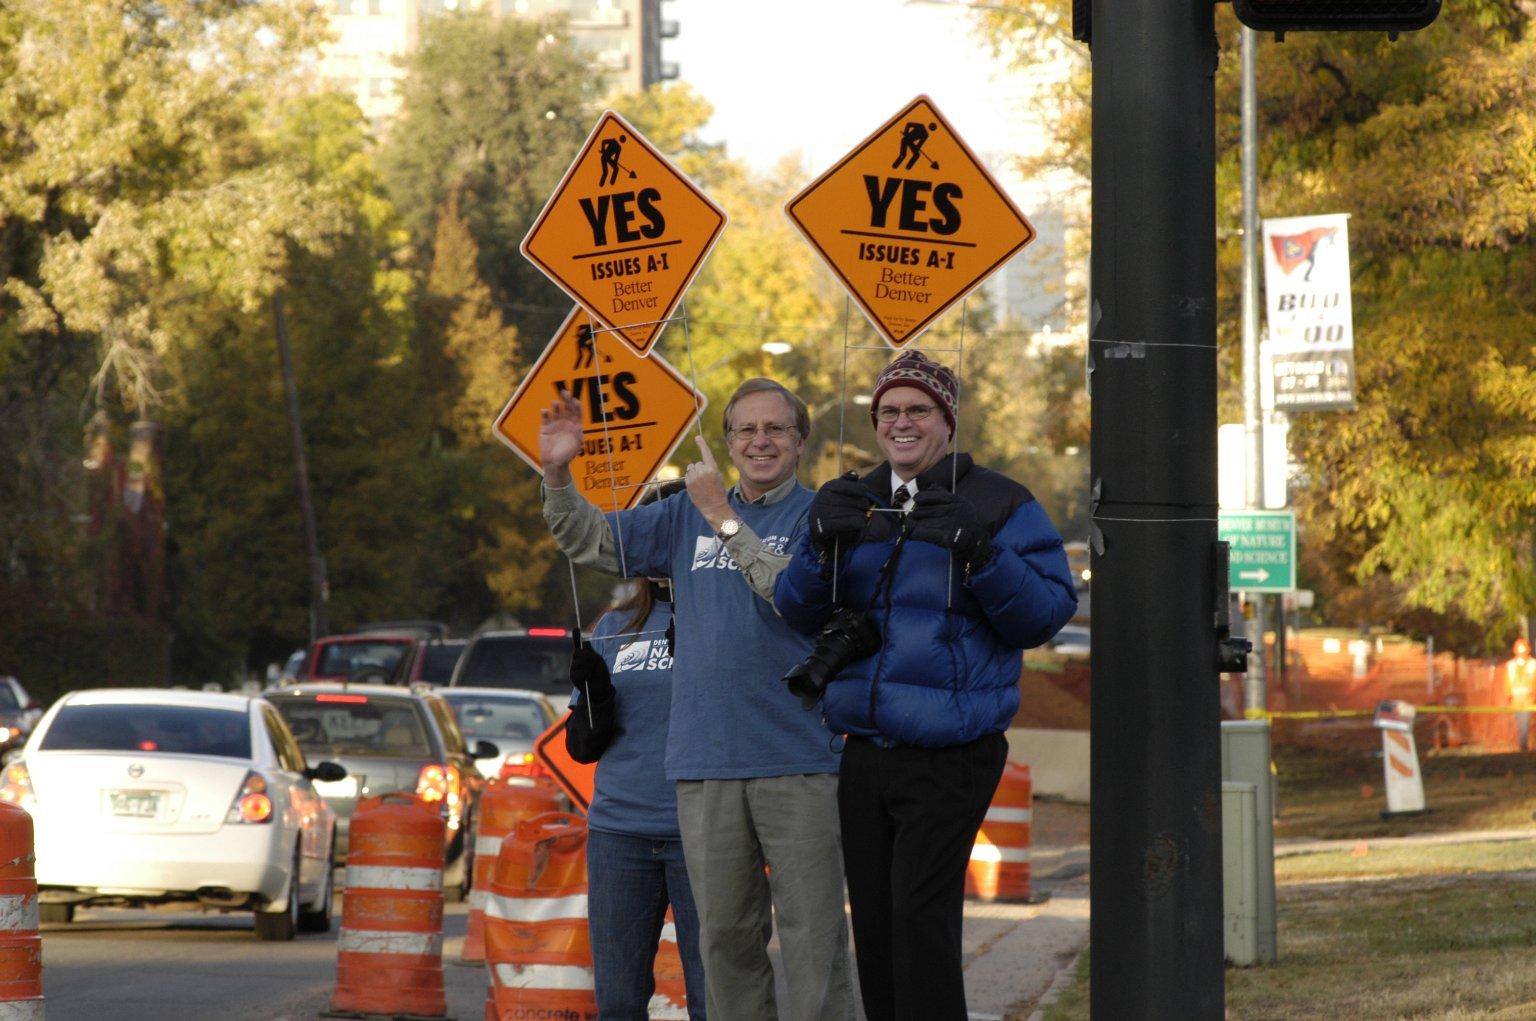 Honk and Wave Campaign for the Better Denver Bond Program